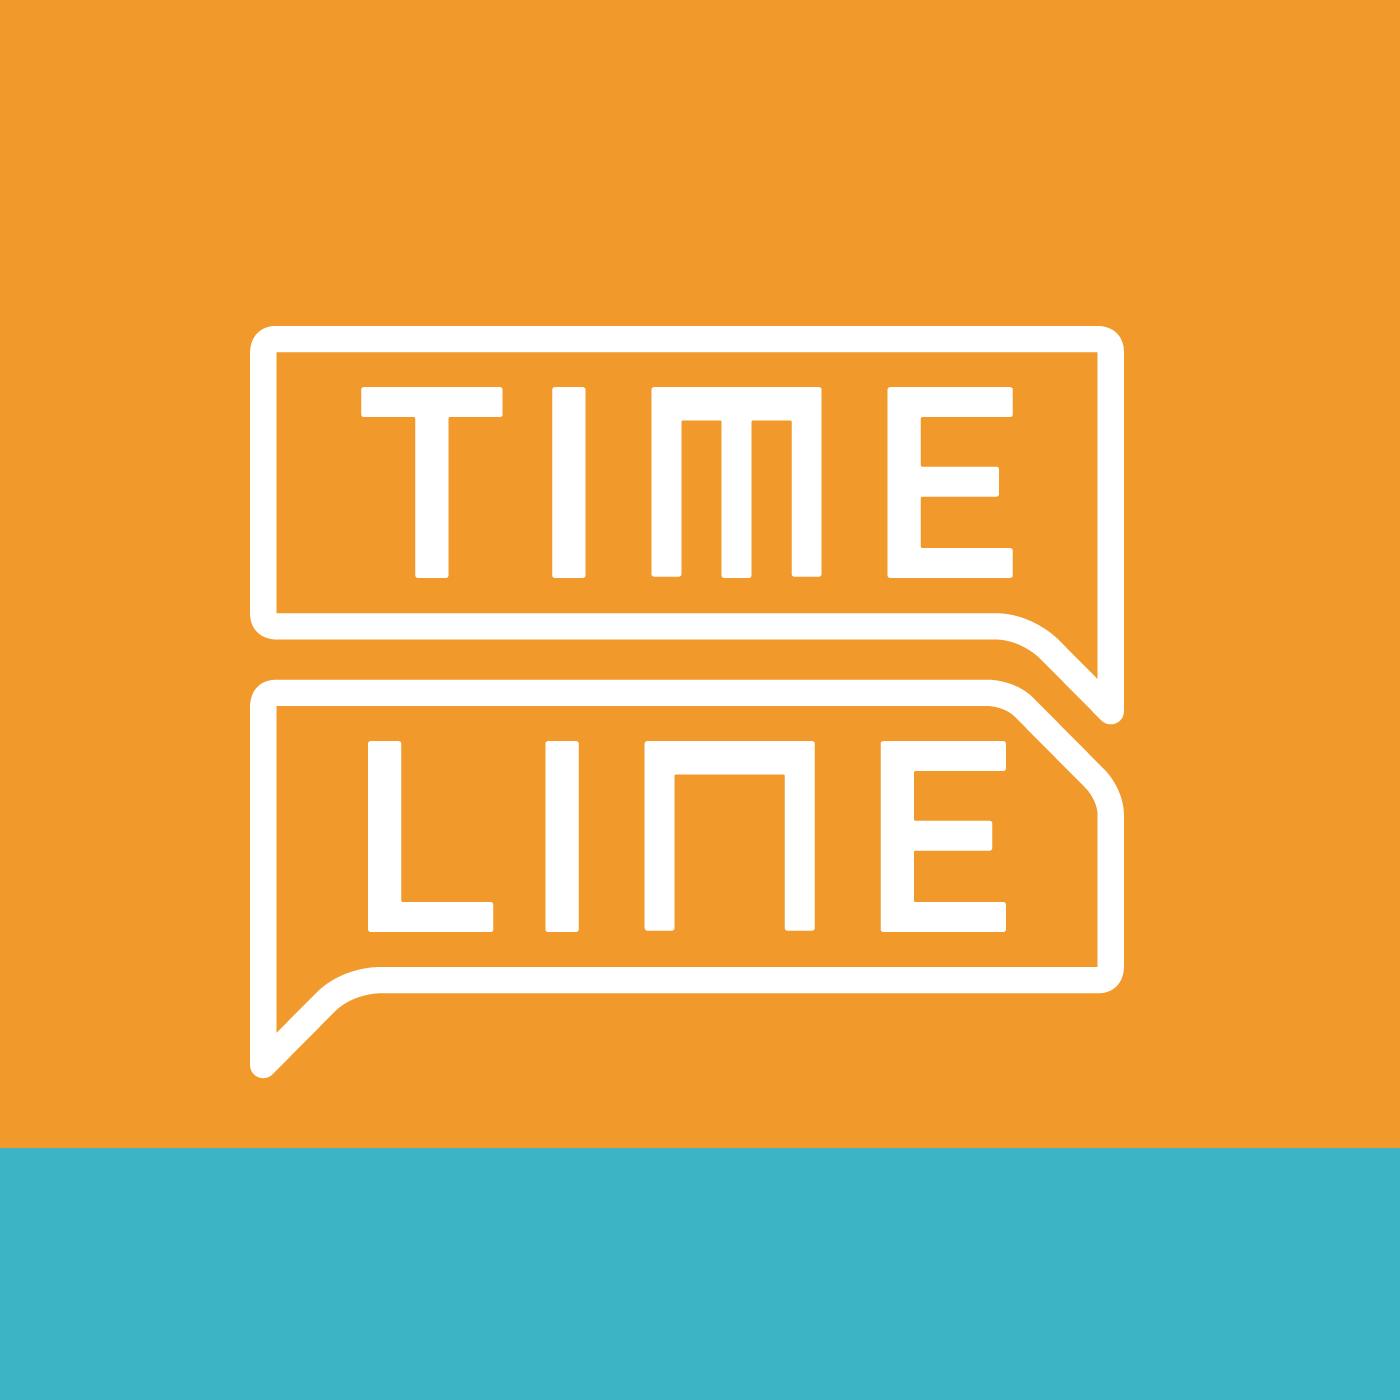 Timeline Gaúcha 22.02.2018